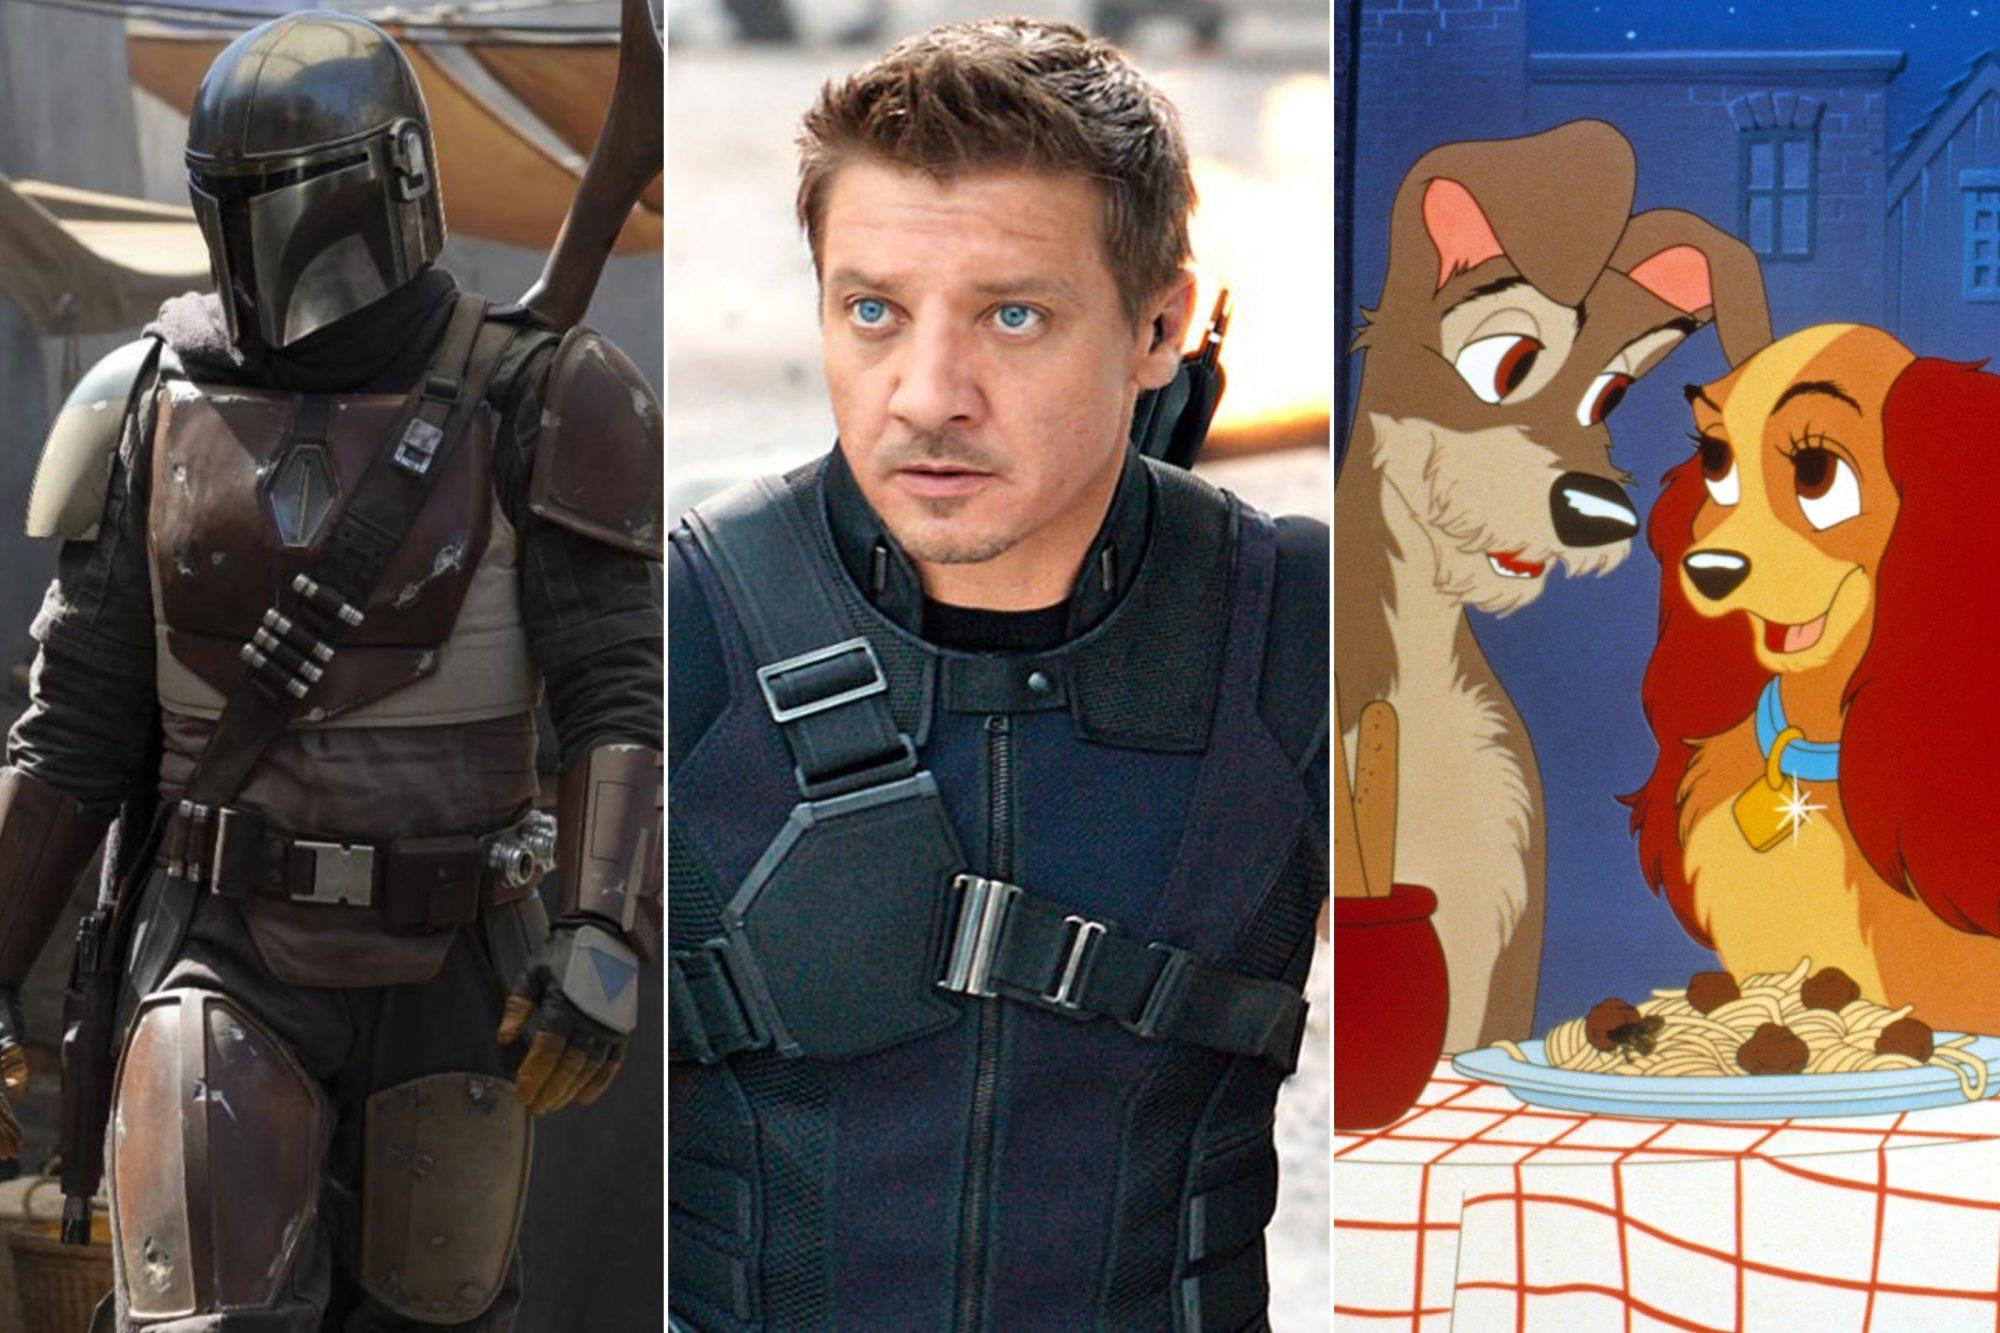 Disney+ Streaming serviceCredit: Lucasfilm; Marvel; Disney